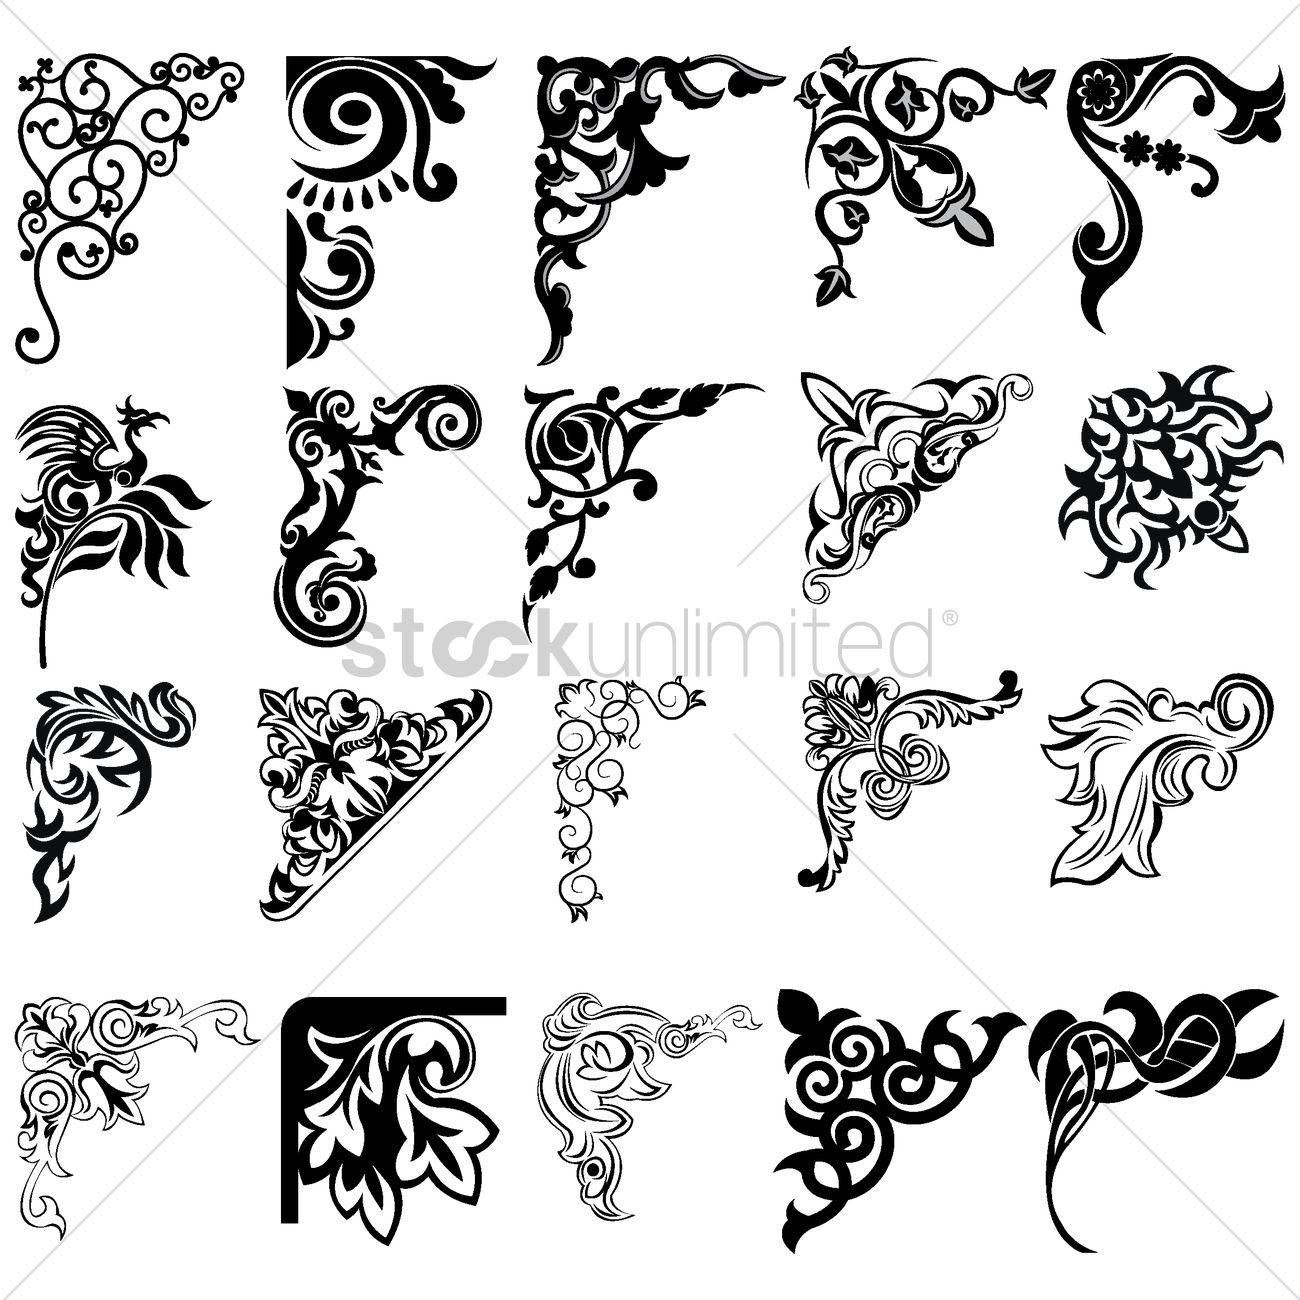 Corner Element Designs Vector Image